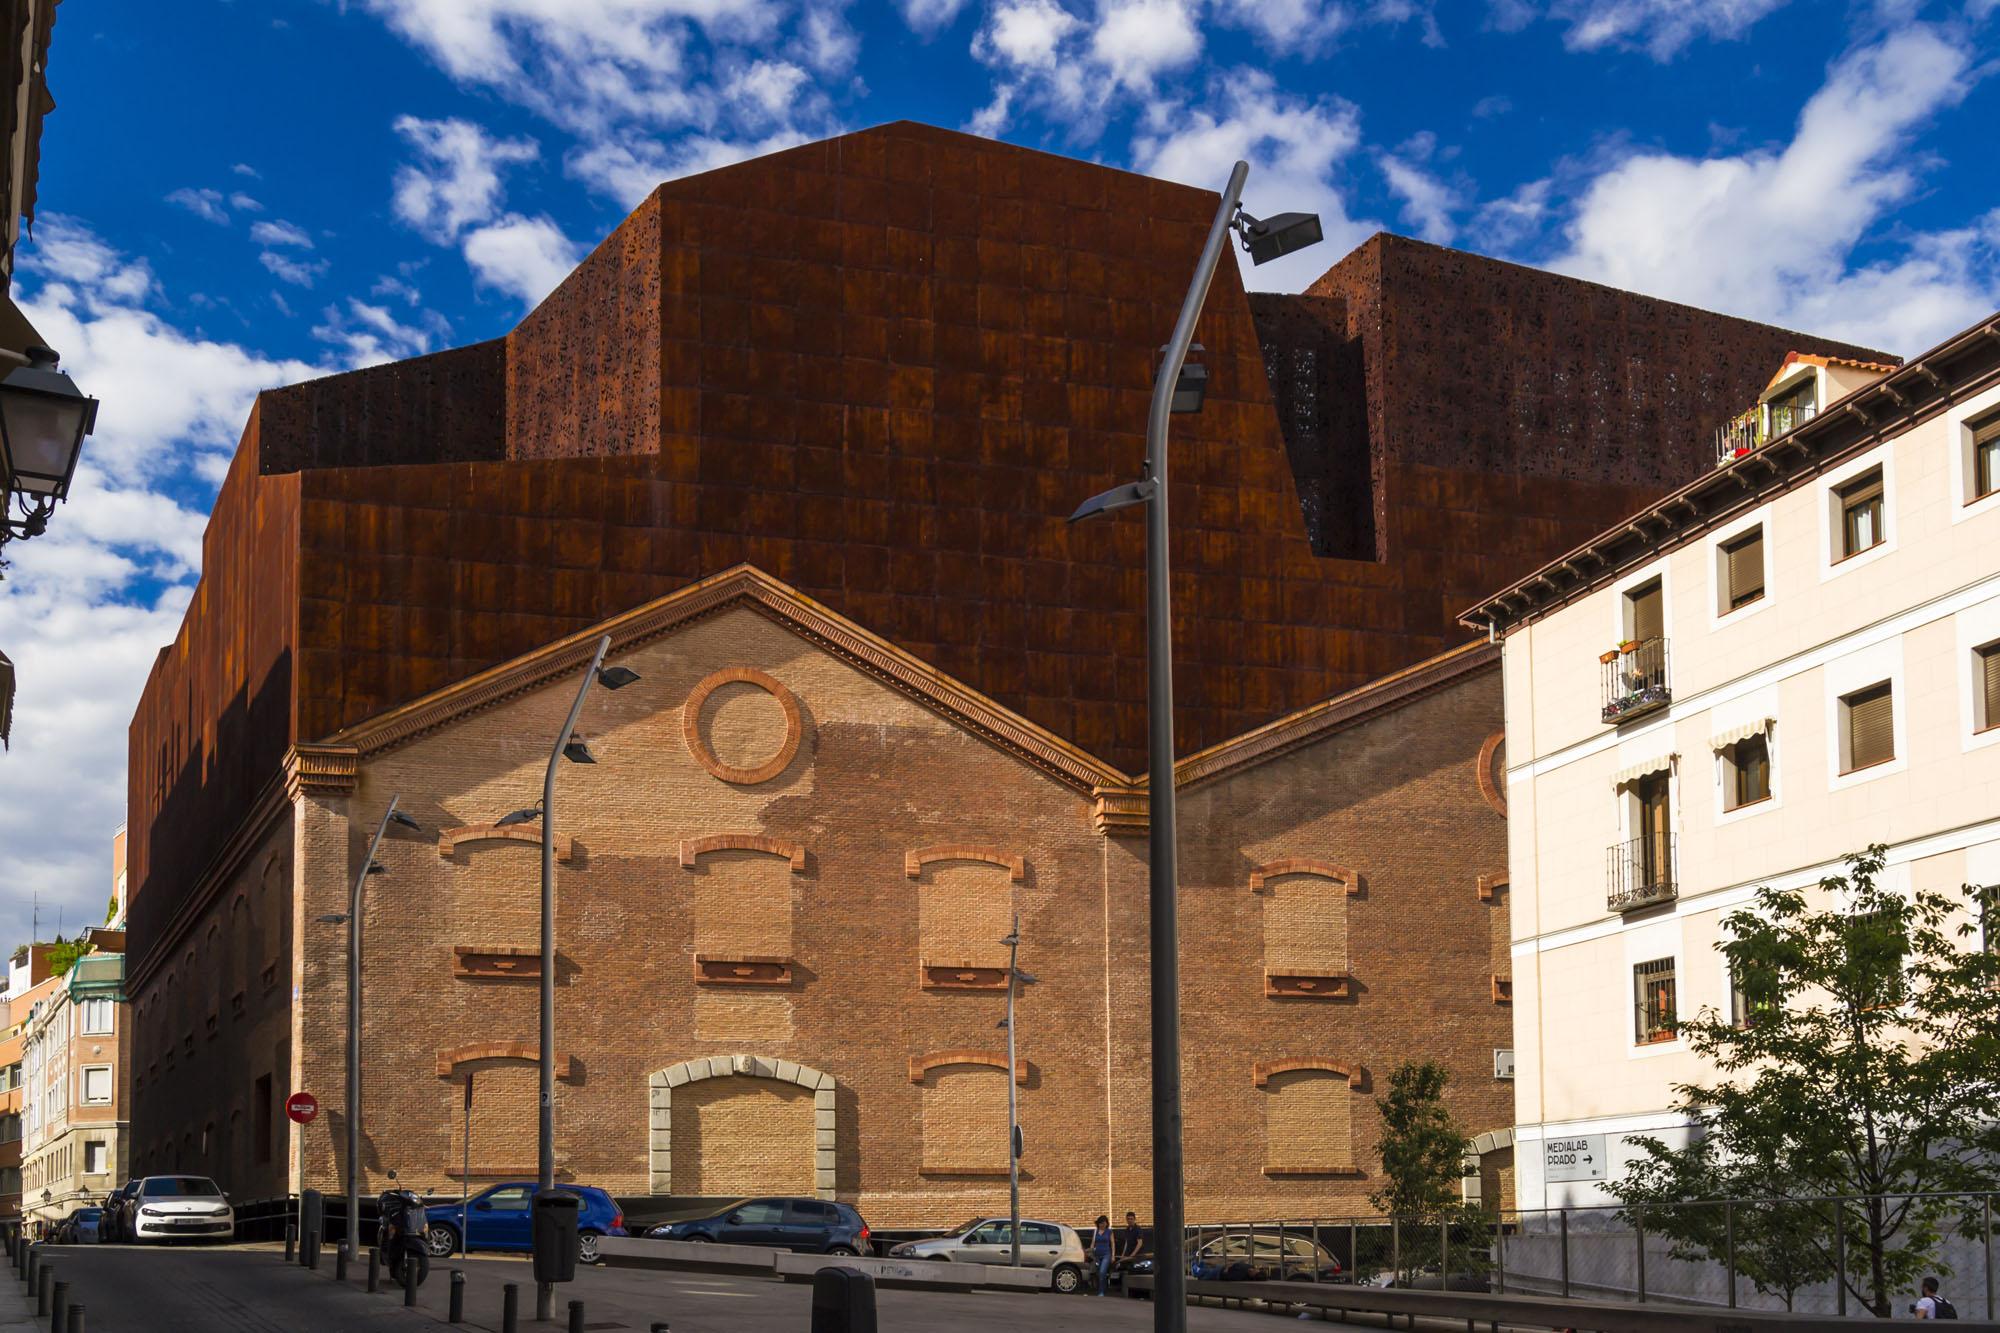 Caixaforum madrid herzon de meuron jard n vertical - Trabajo arquitecto madrid ...